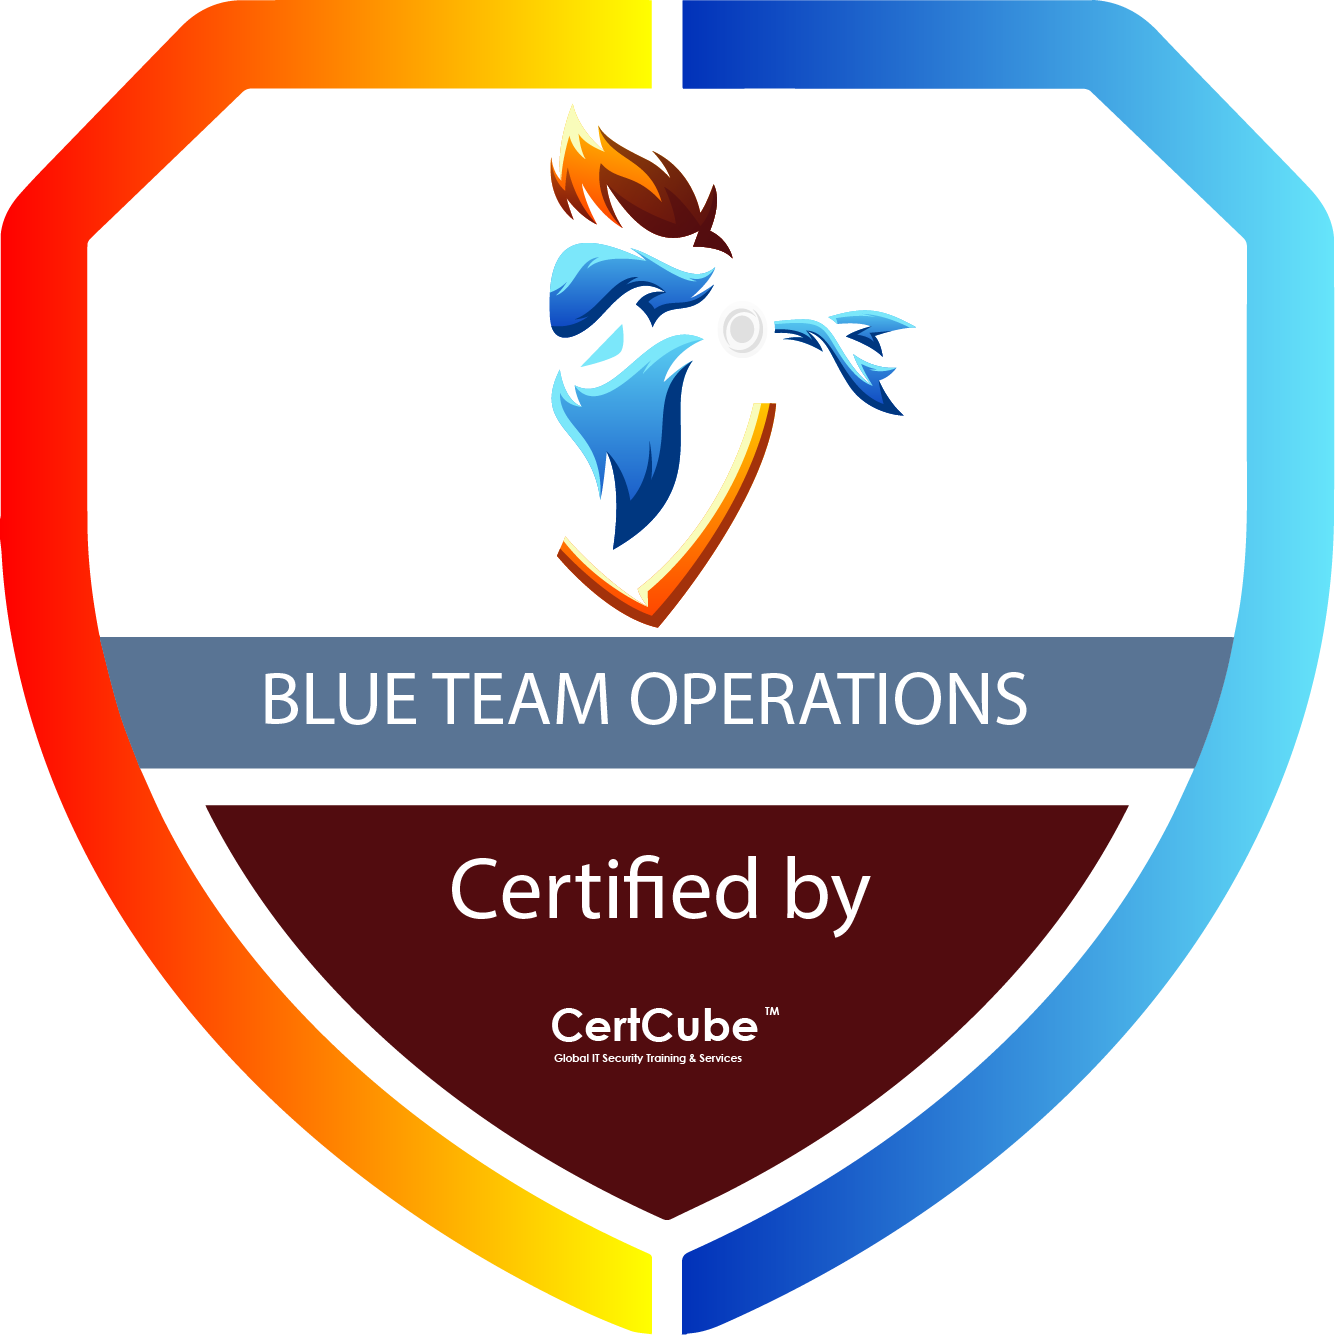 BLUE TEAM OPERATIONS